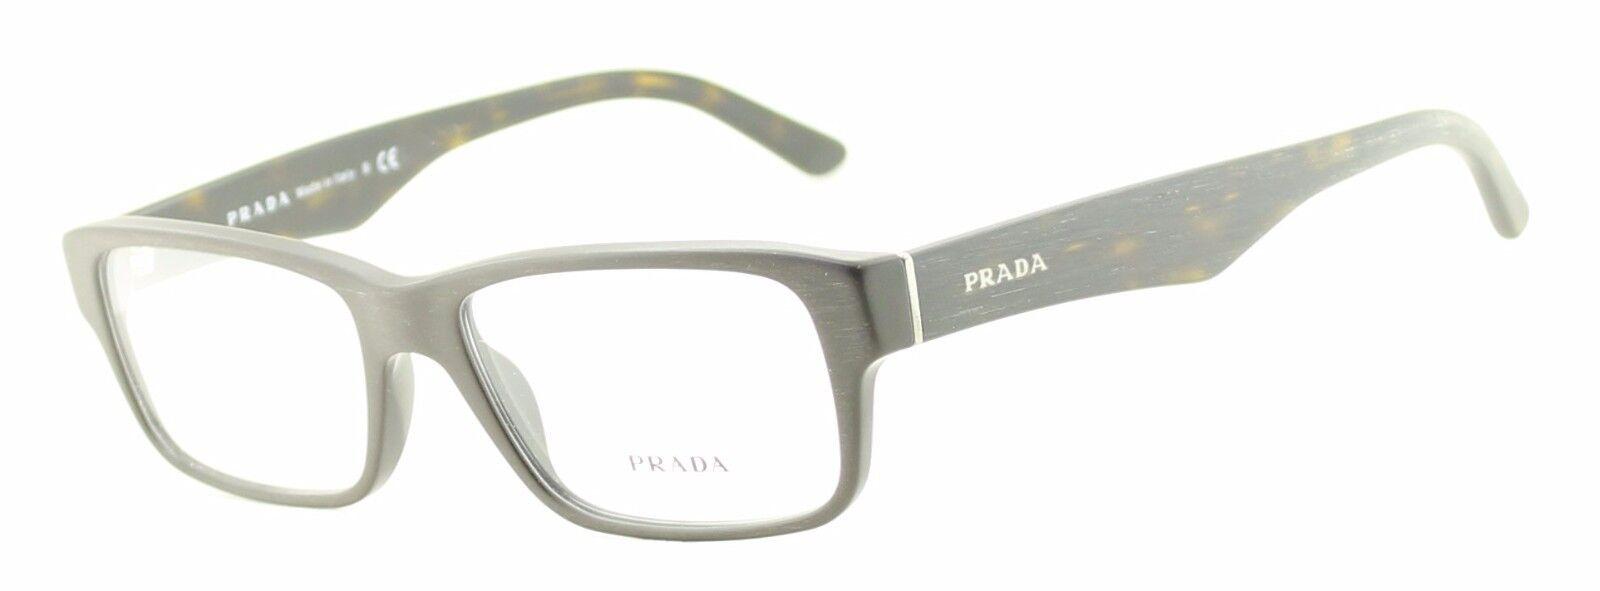 e07037a989 PRADA VPR 16m Ubh-1o1 53mm Eyewear Frames Eyeglasses RX Optical Glasses -  Italy